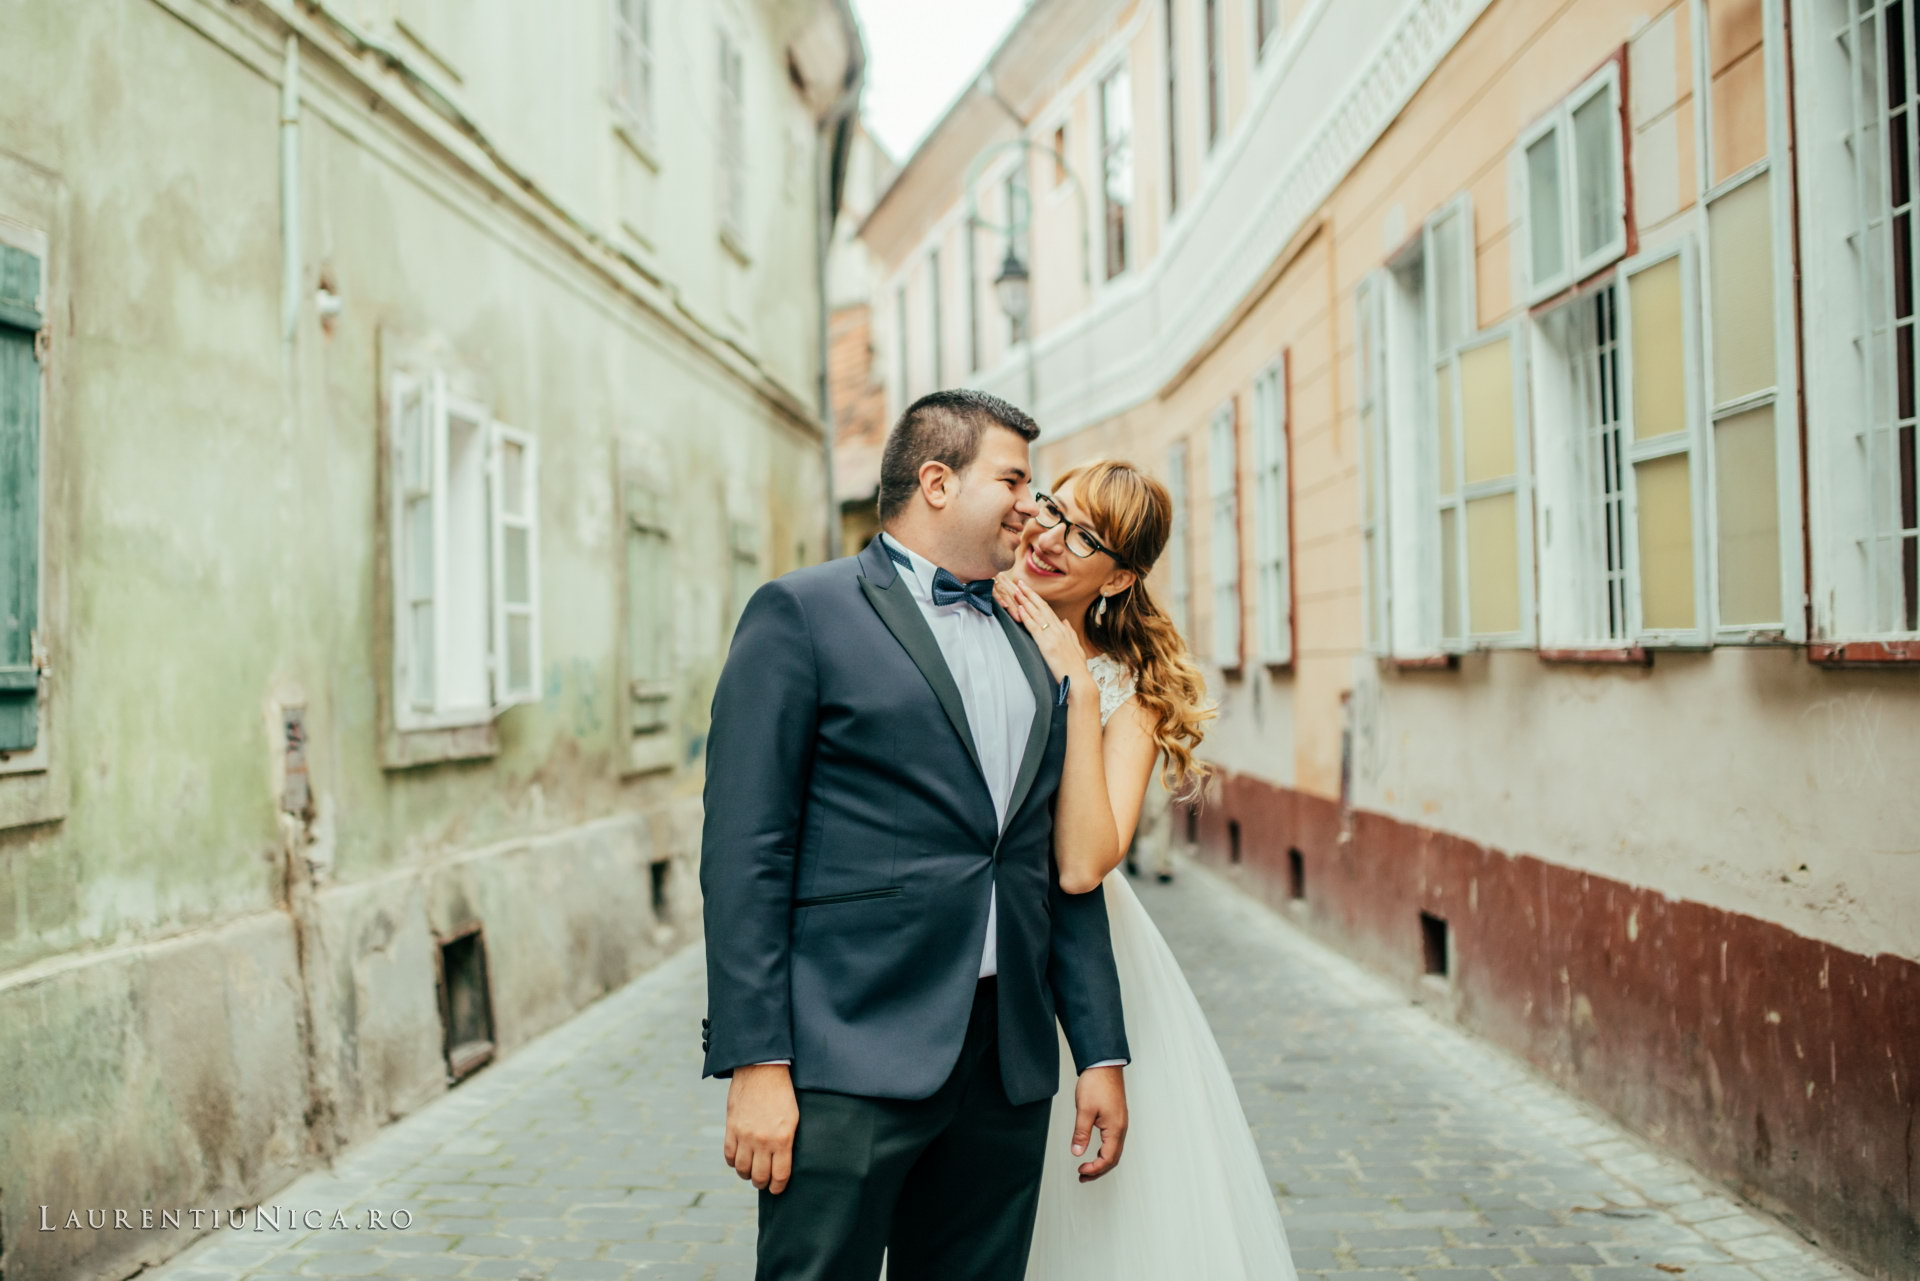 iulia-si-cosmin-fotografii-after-wedding-brasov-laurentiu-nica23